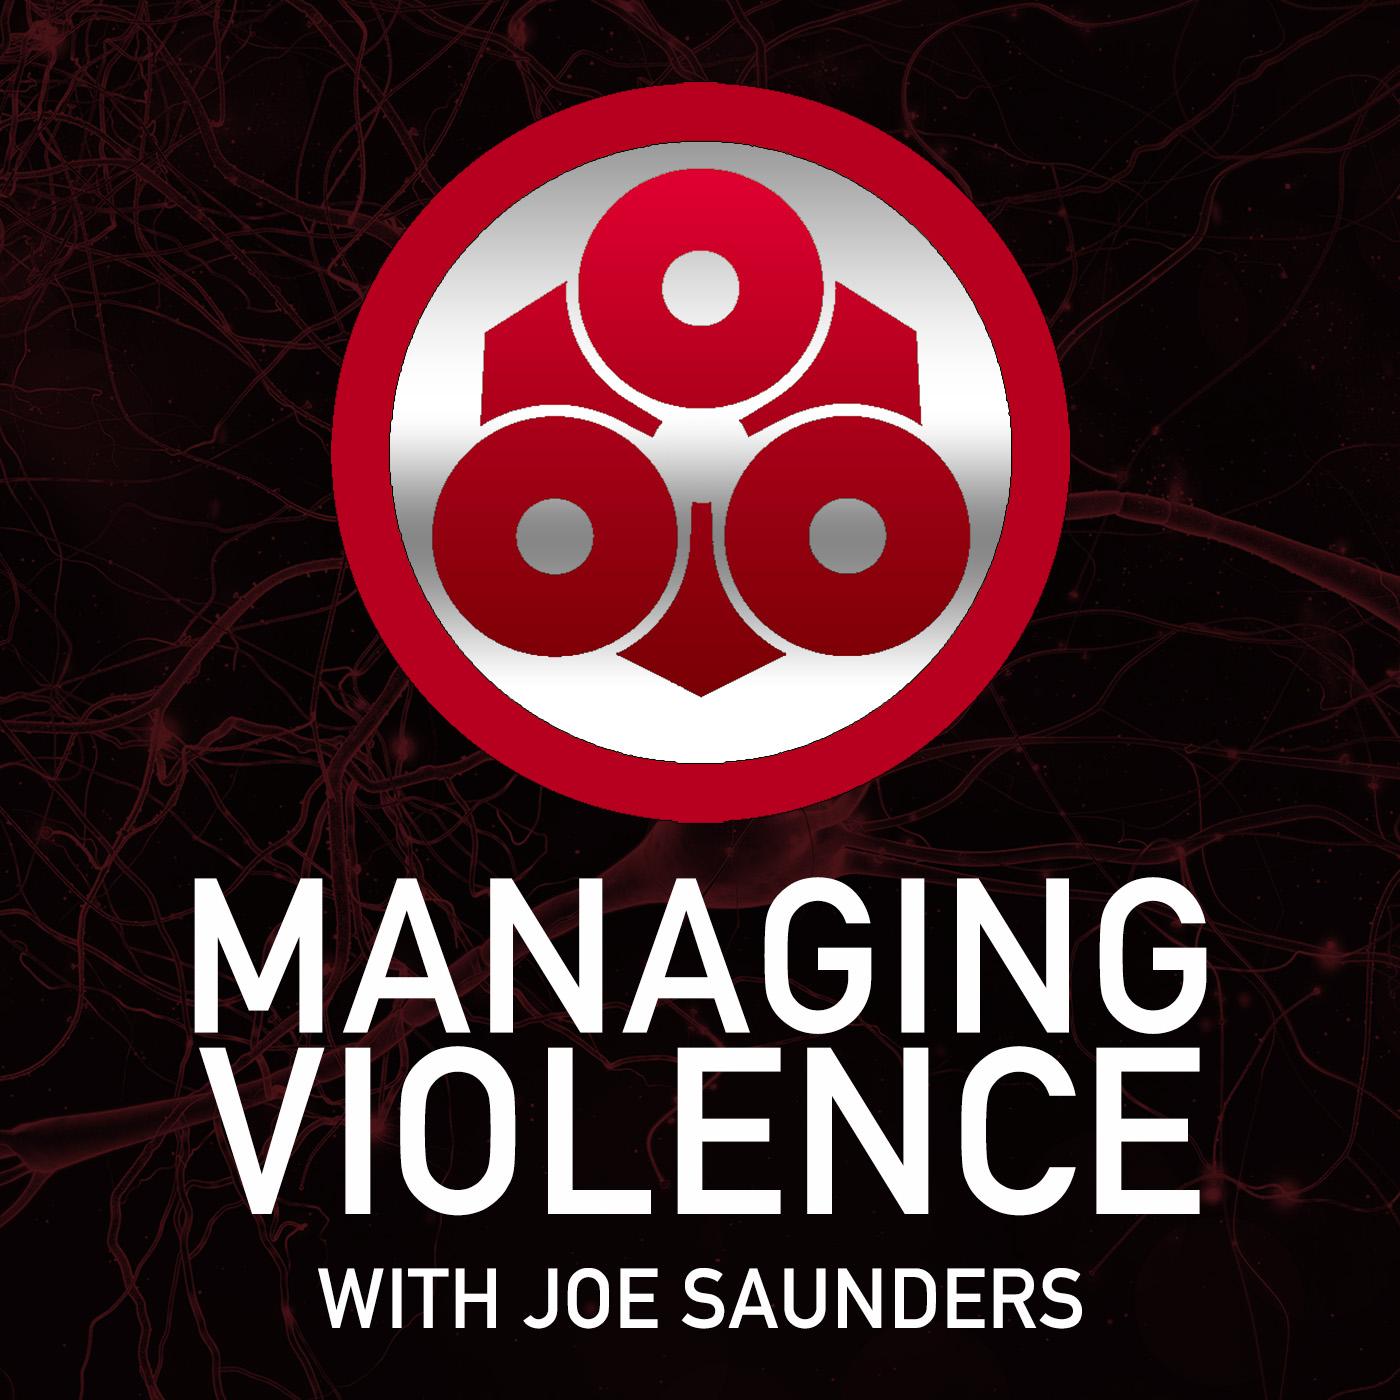 Managing Violence with Joe Saunders